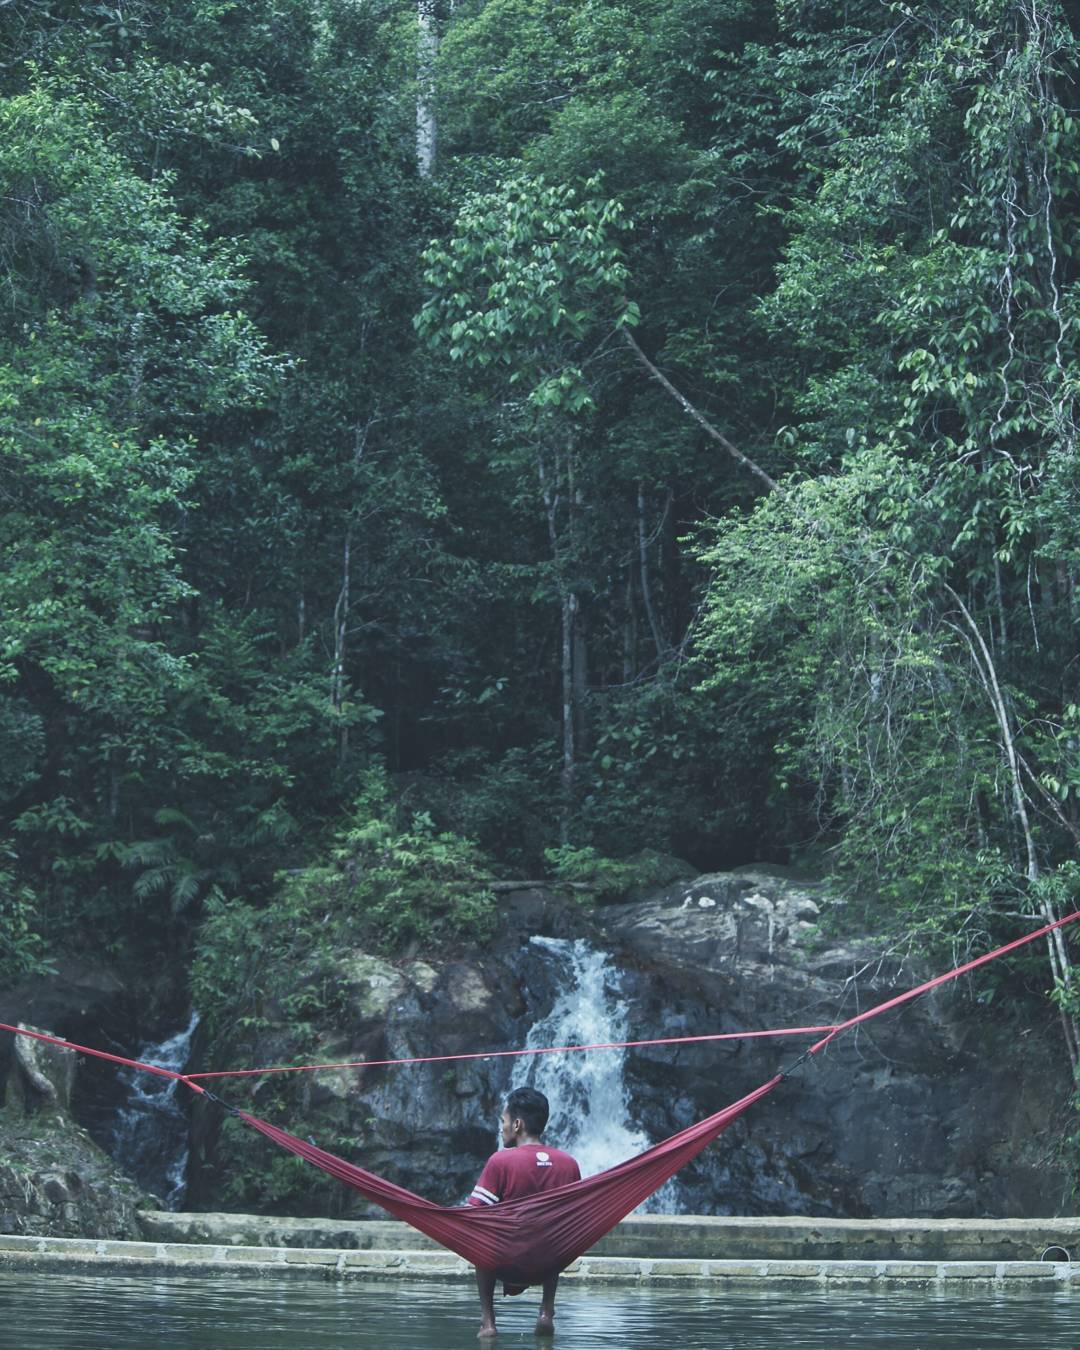 15 Tempat Wisata di Lingga Kepulauan Riau Paling Populer dan ...